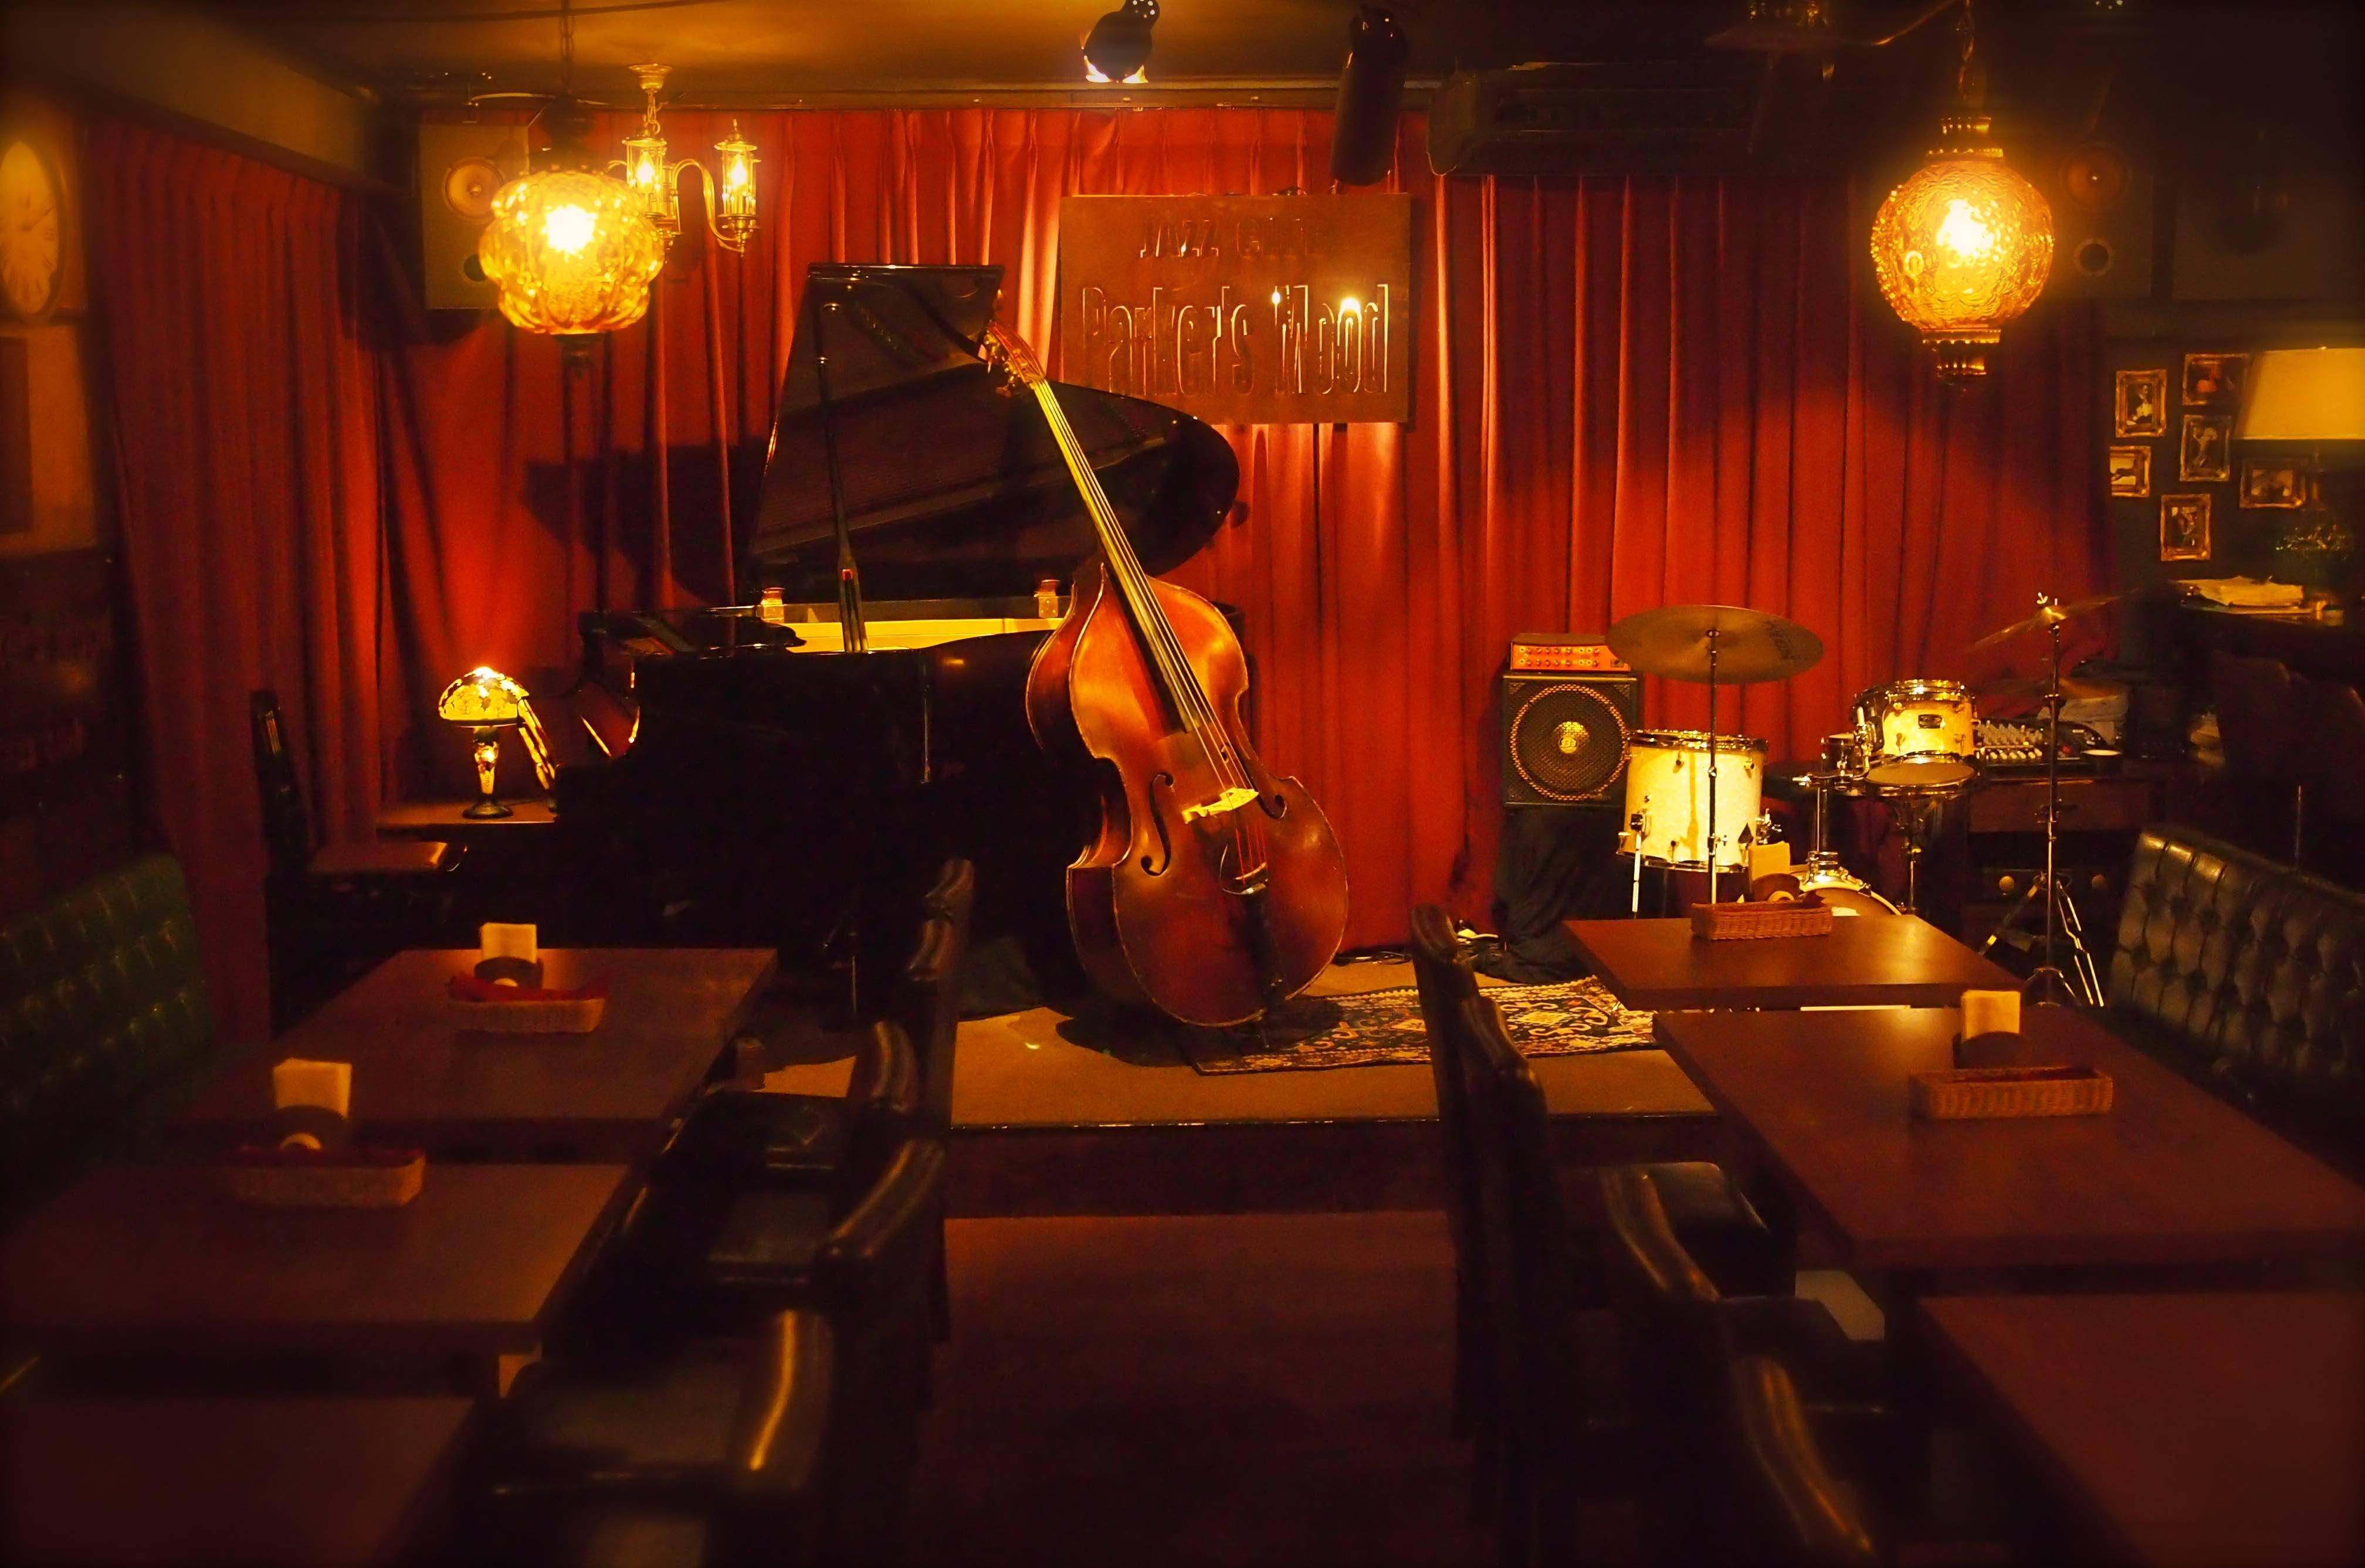 Parker's Mood Jazz Club 오키나와 나하 재즈